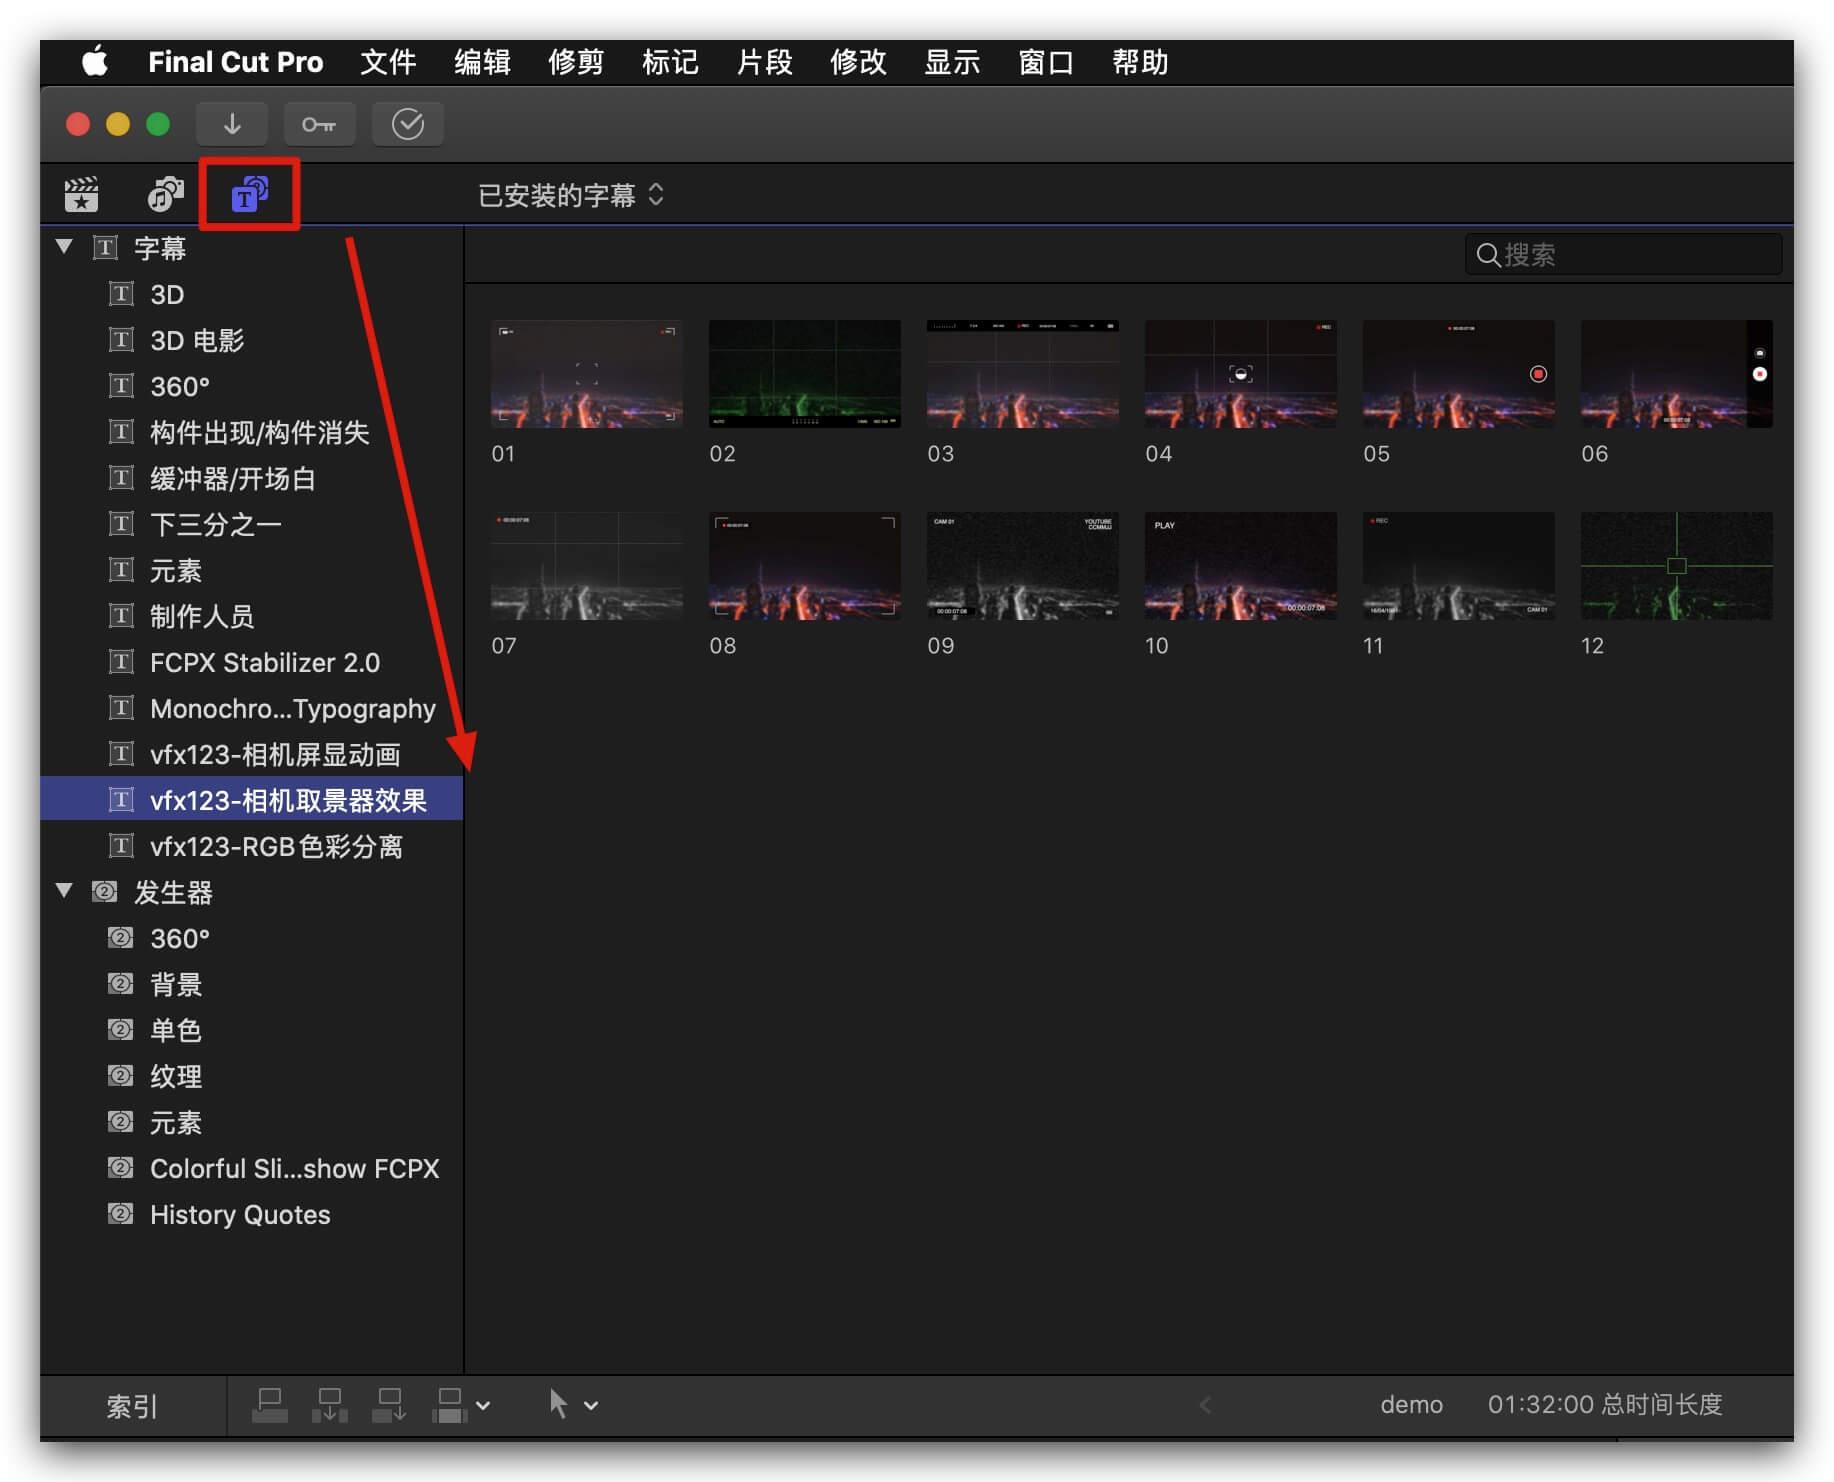 fcpx插件 相机取景器录制数码屏显前景动画带画面效果预设 Camera REC Viewfinder